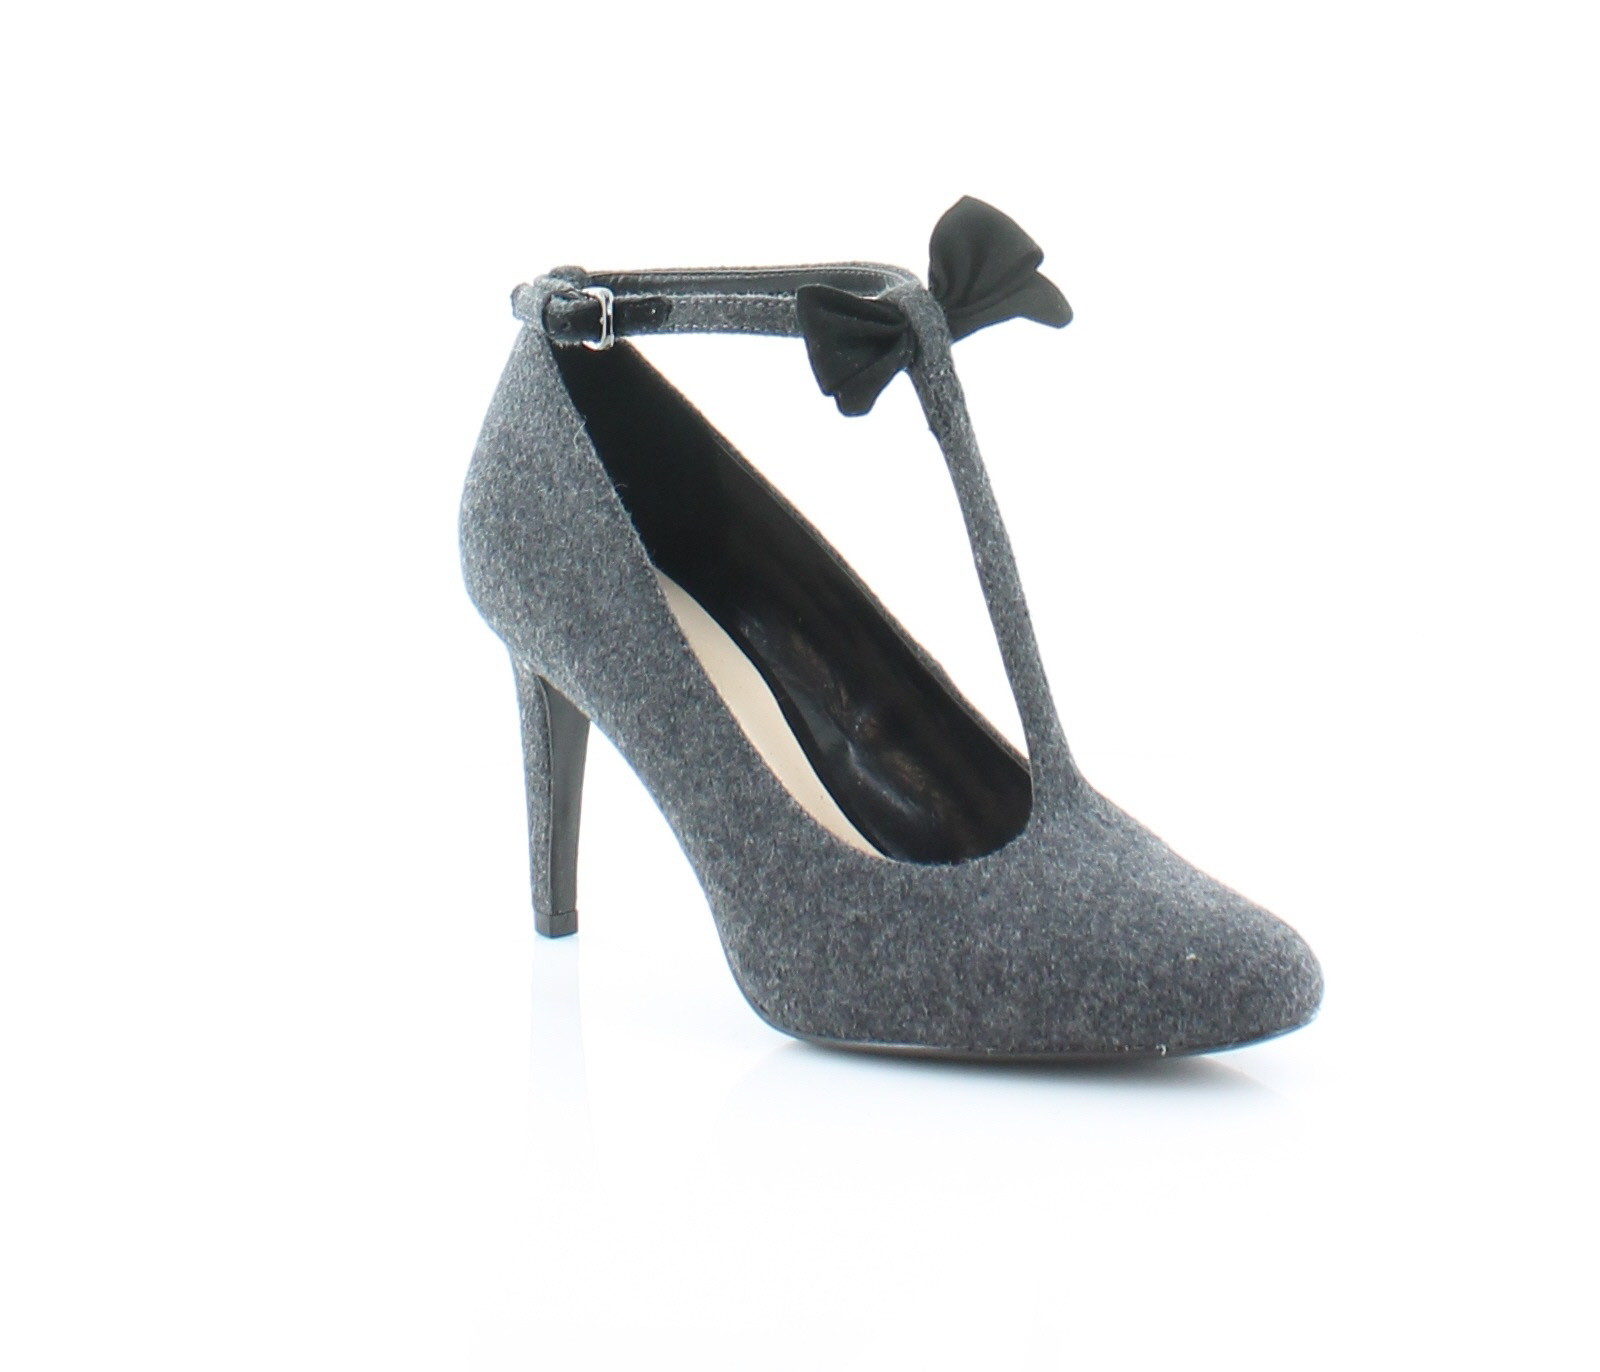 "BCBGeneration PARADE2 Womens Platform Shoes SZ 8 M Tan Dark Brown 5"" Heel Sale"